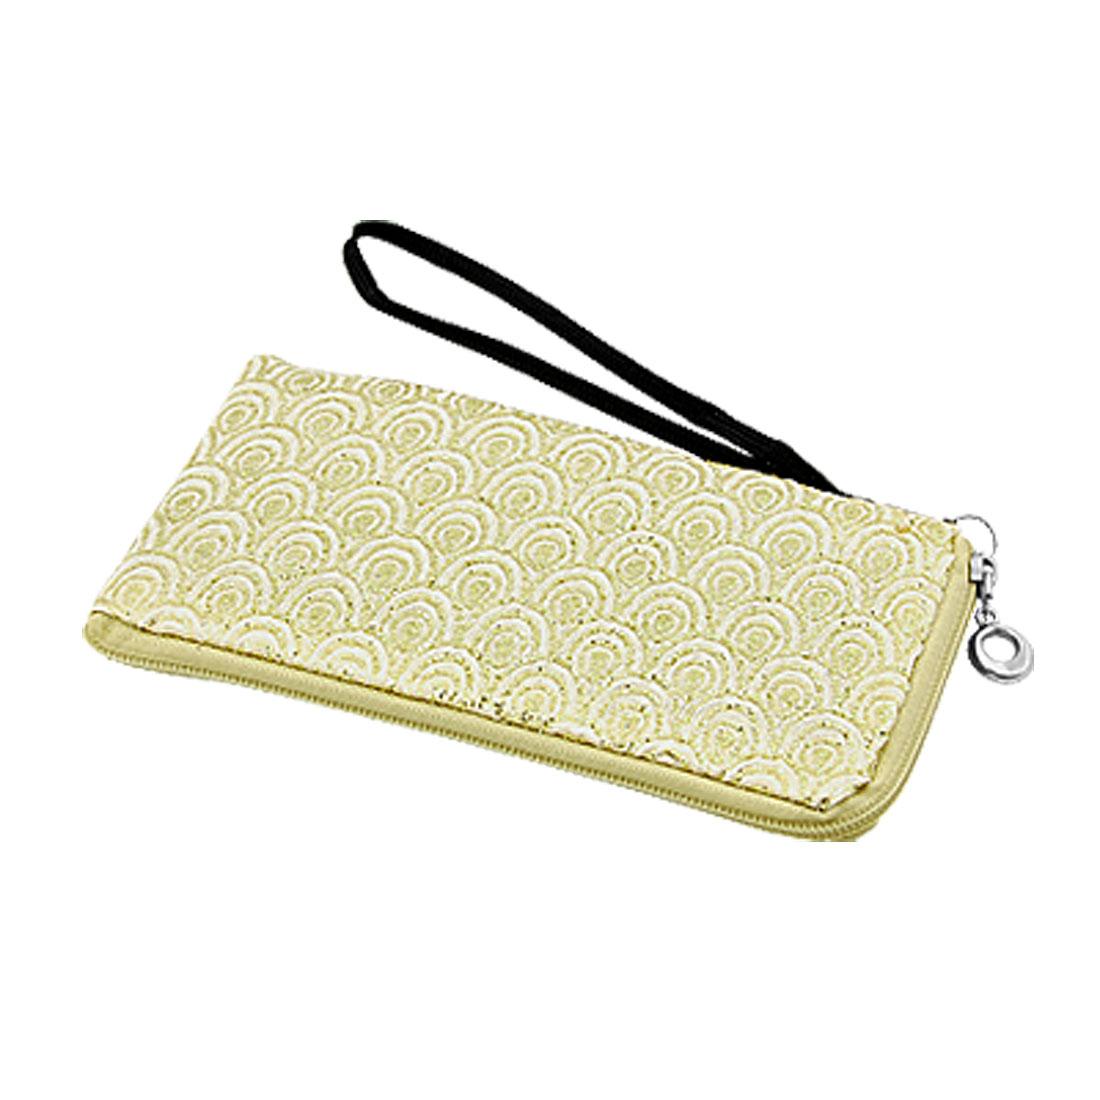 Glittery Nylon Bag Zipper Closure Pouch Wallet for MP3 MP4